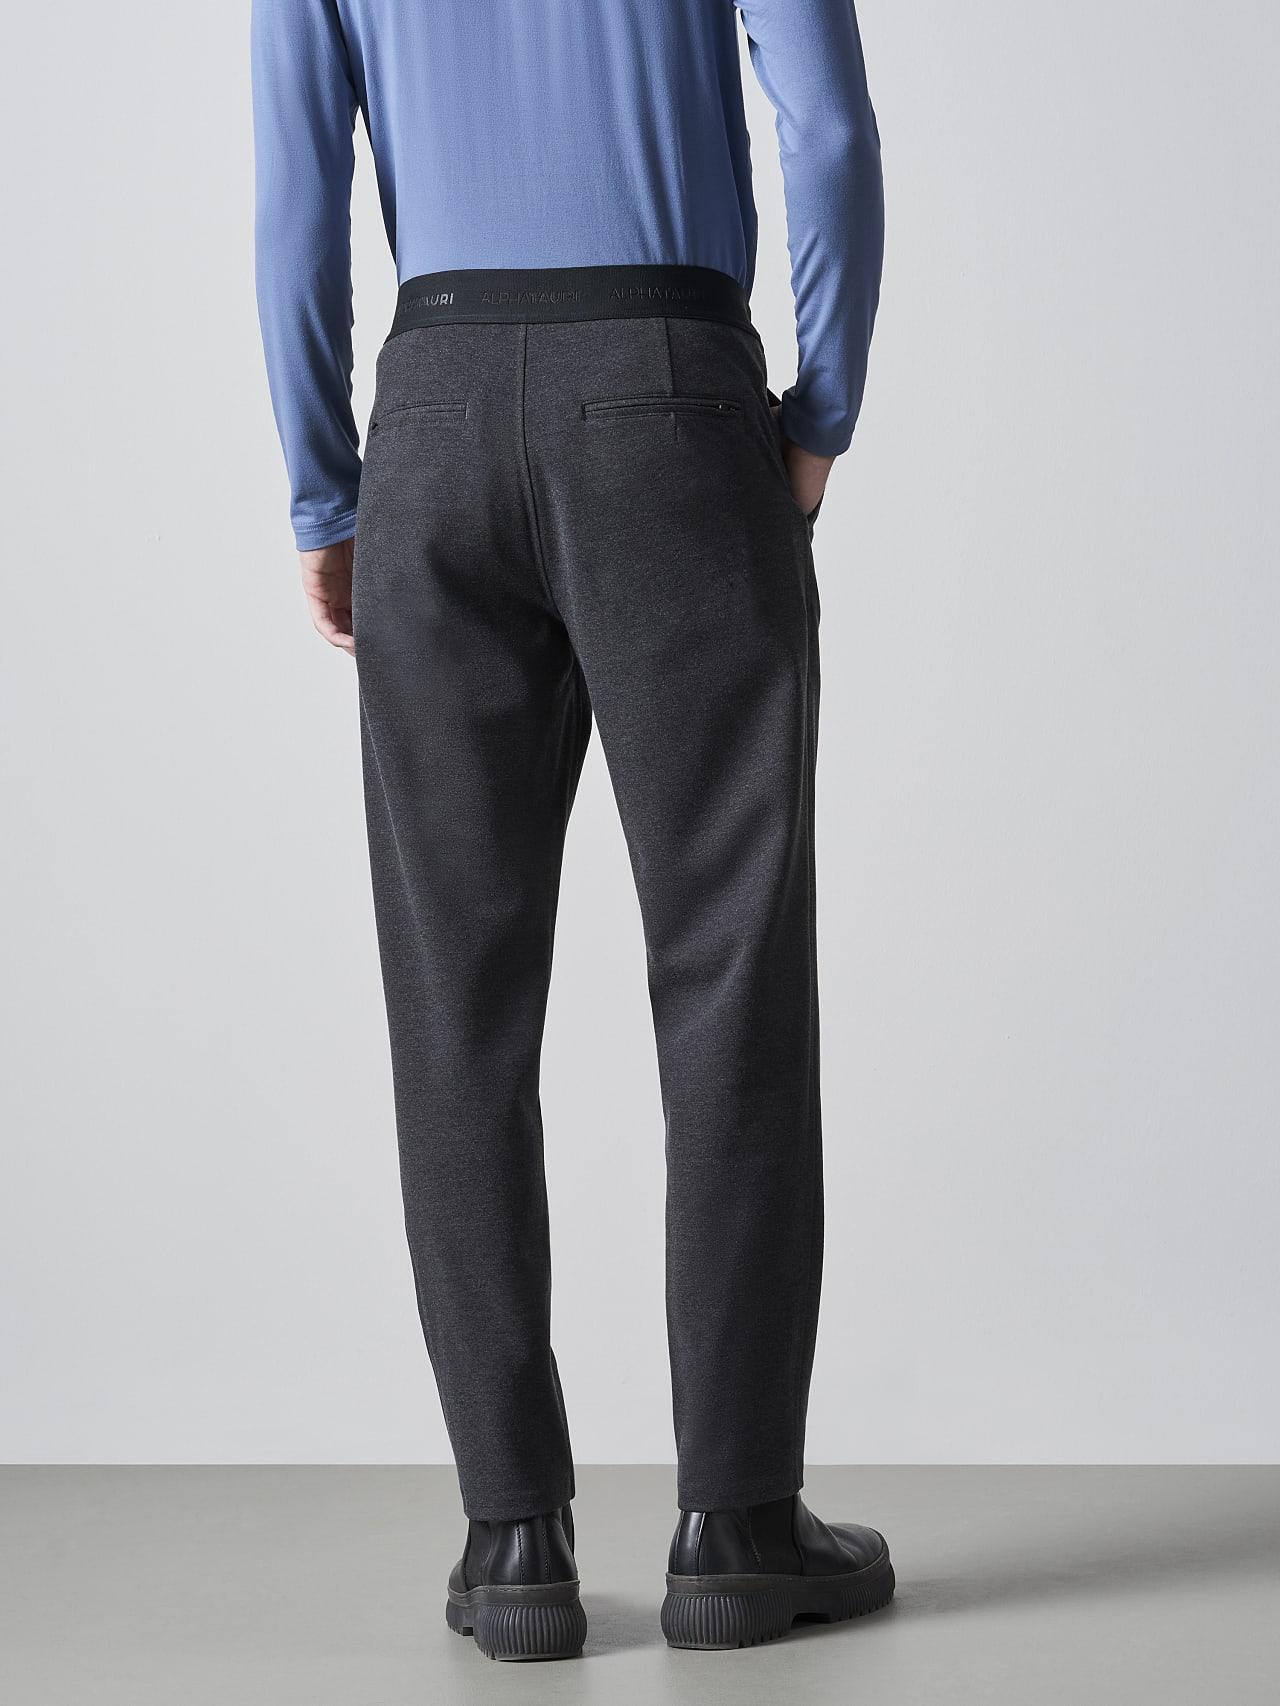 PRINO V2.Y5.02 Cropped Waterproof Sweat Pants dark grey / anthracite Front Main Alpha Tauri